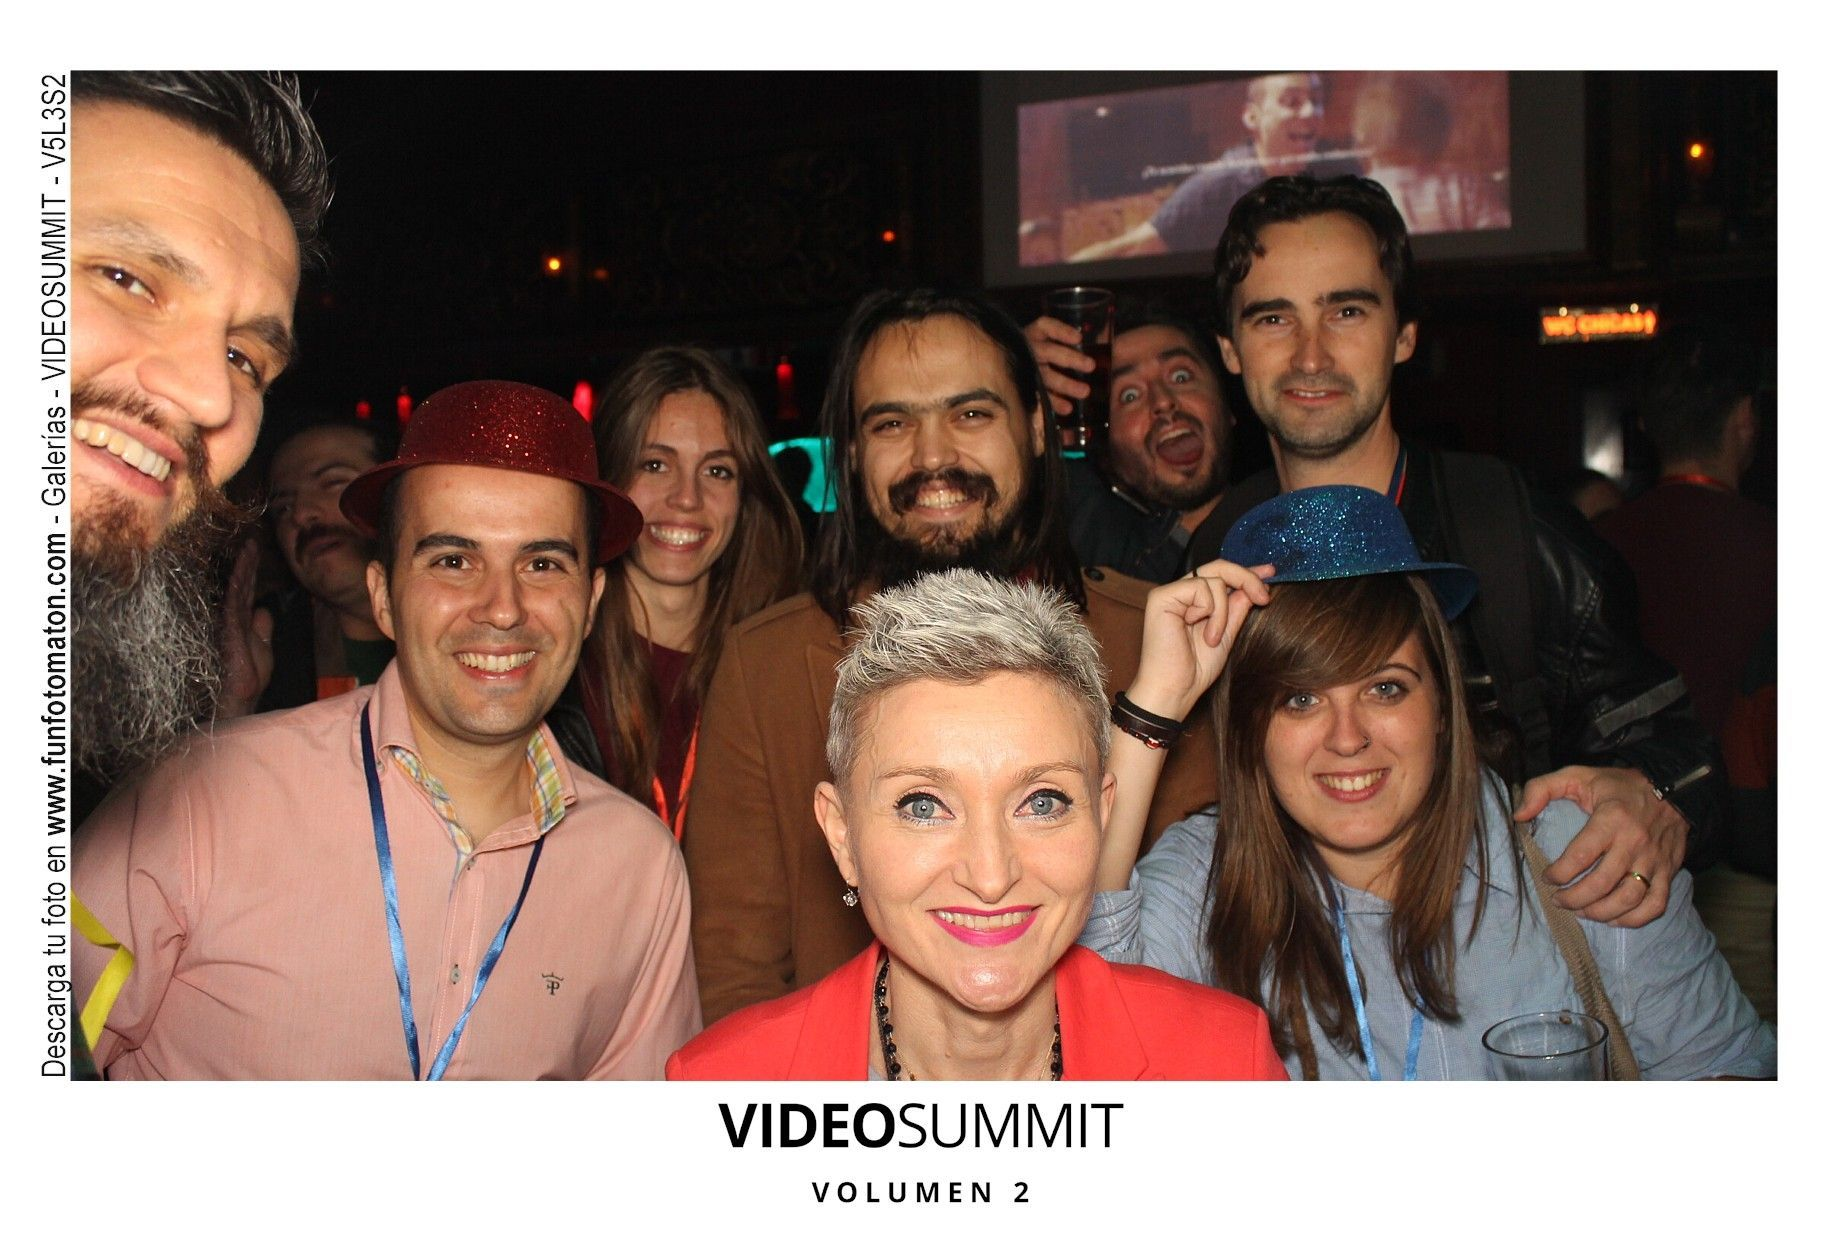 videosummit-vol2-club-party-023